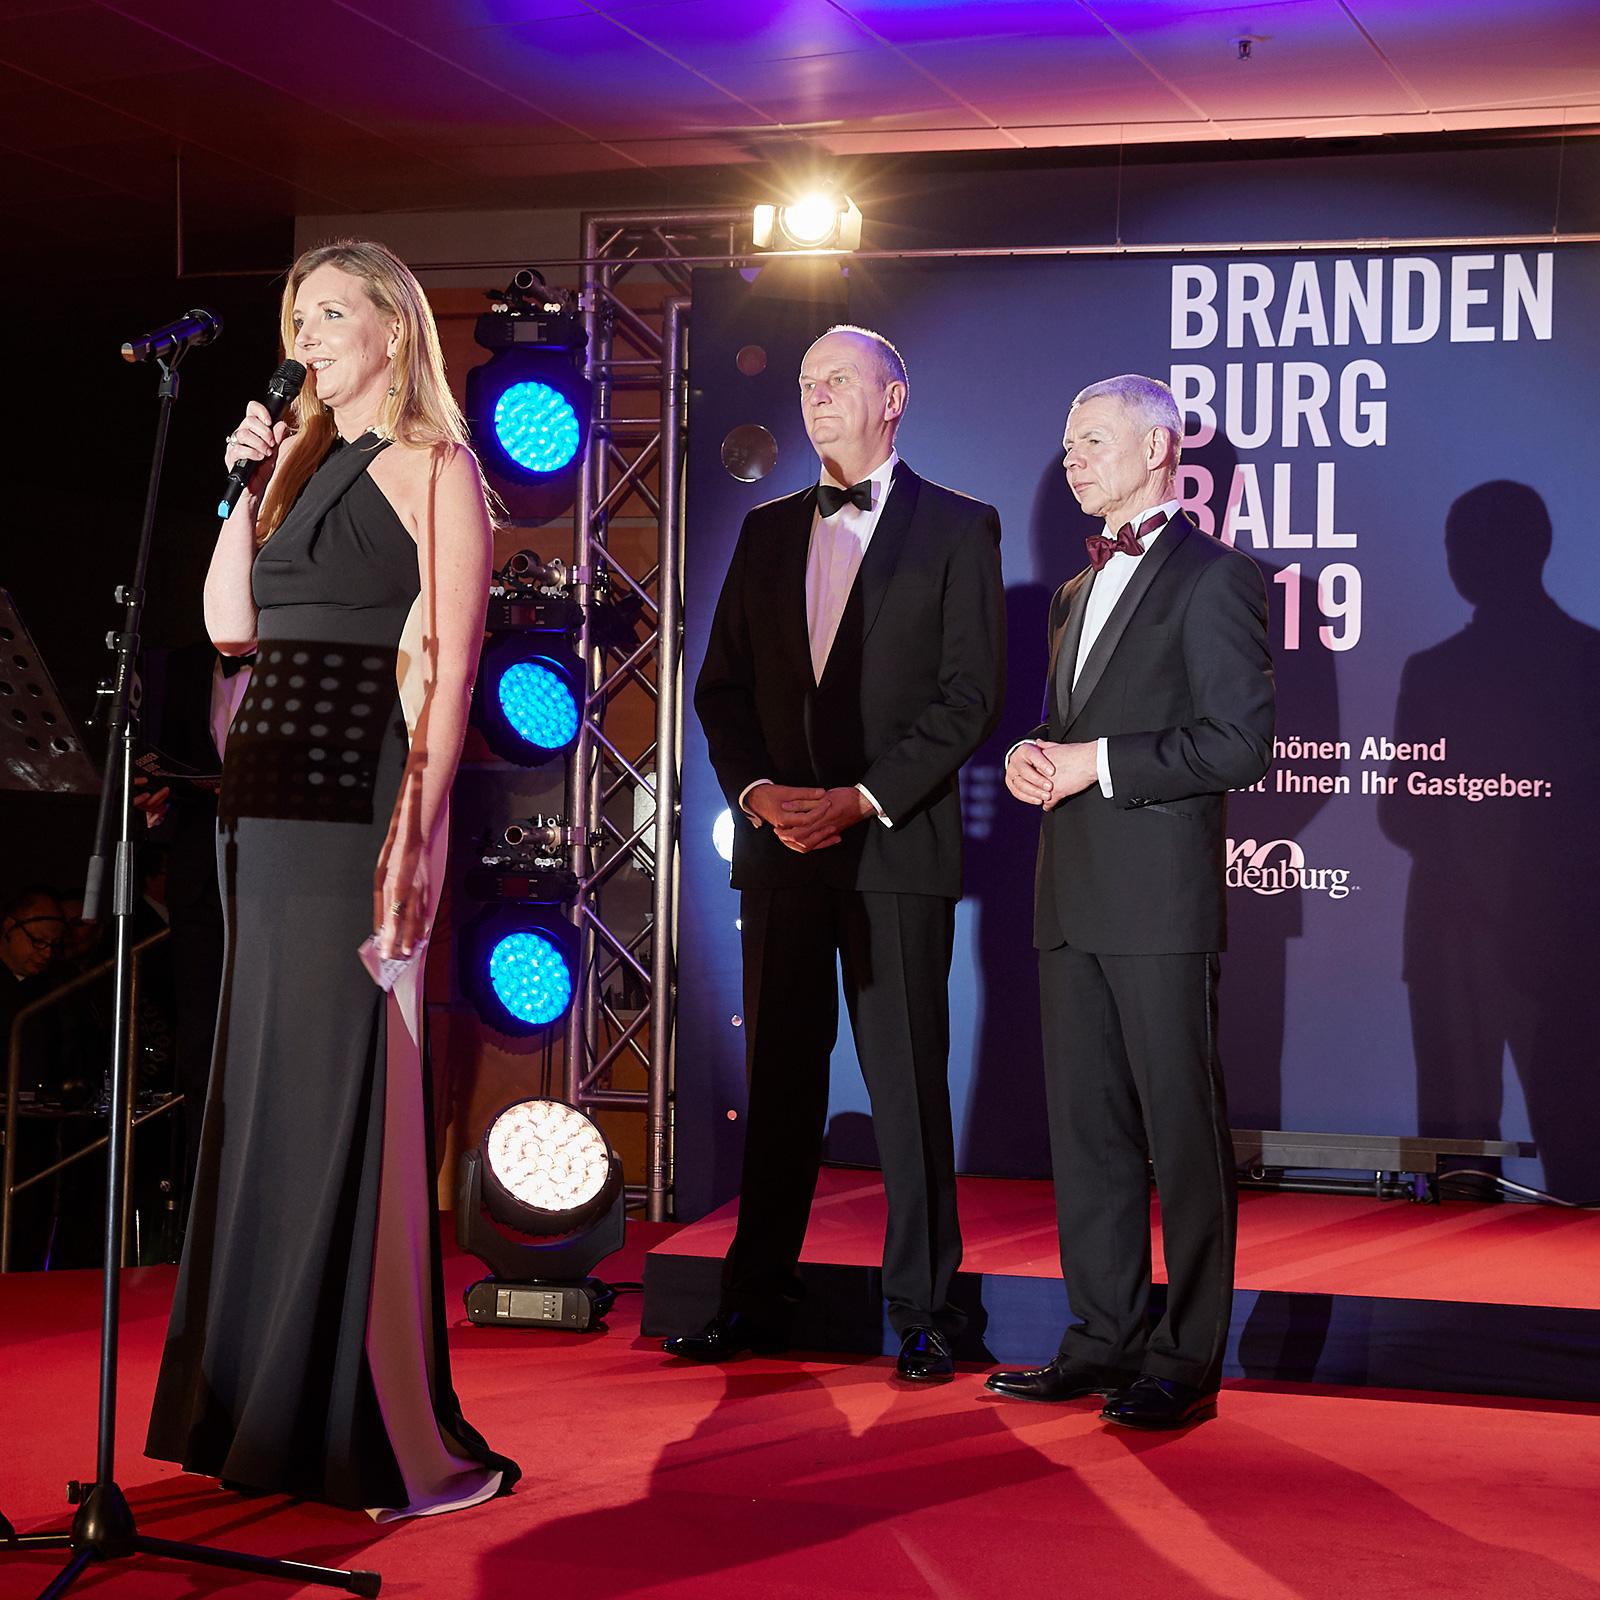 Brandenburgball_2019-8